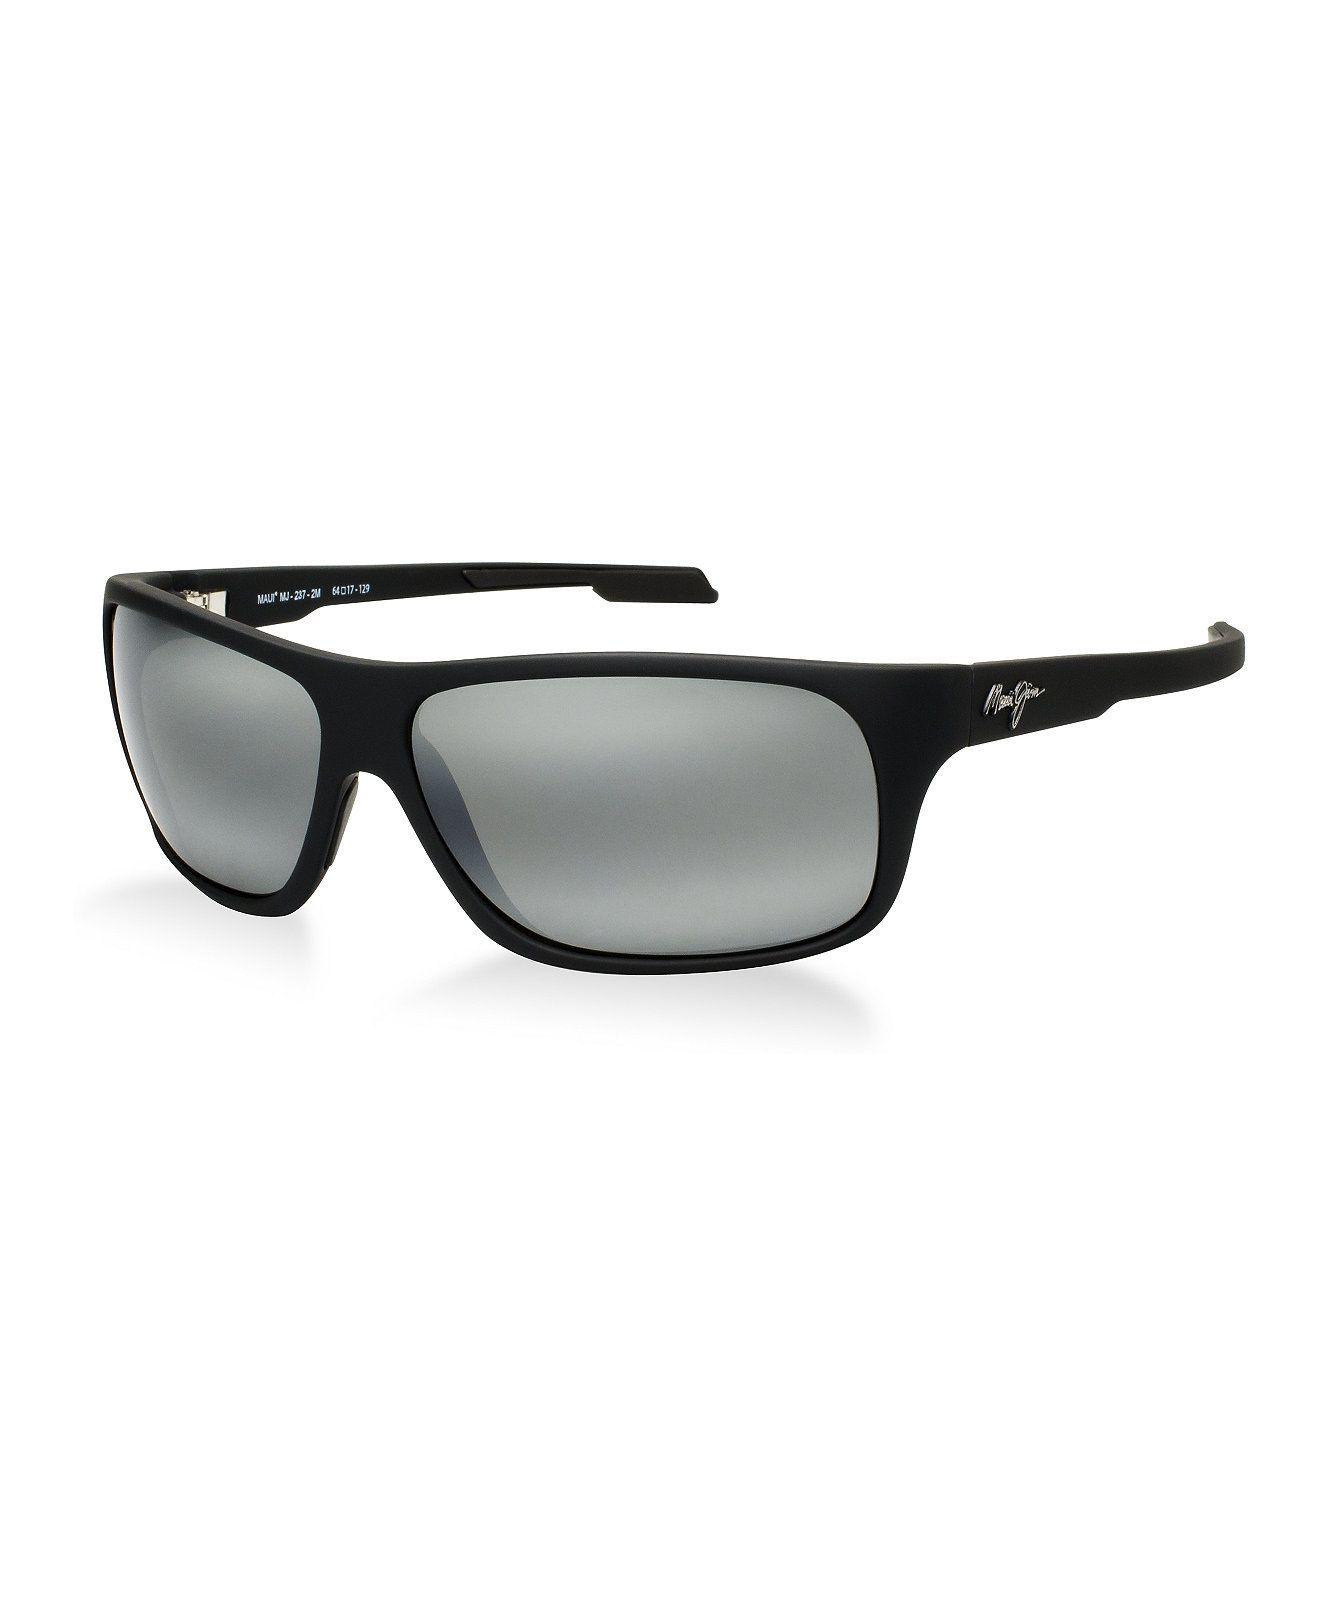 b2573a041d6 Maui Jim Sunglasses